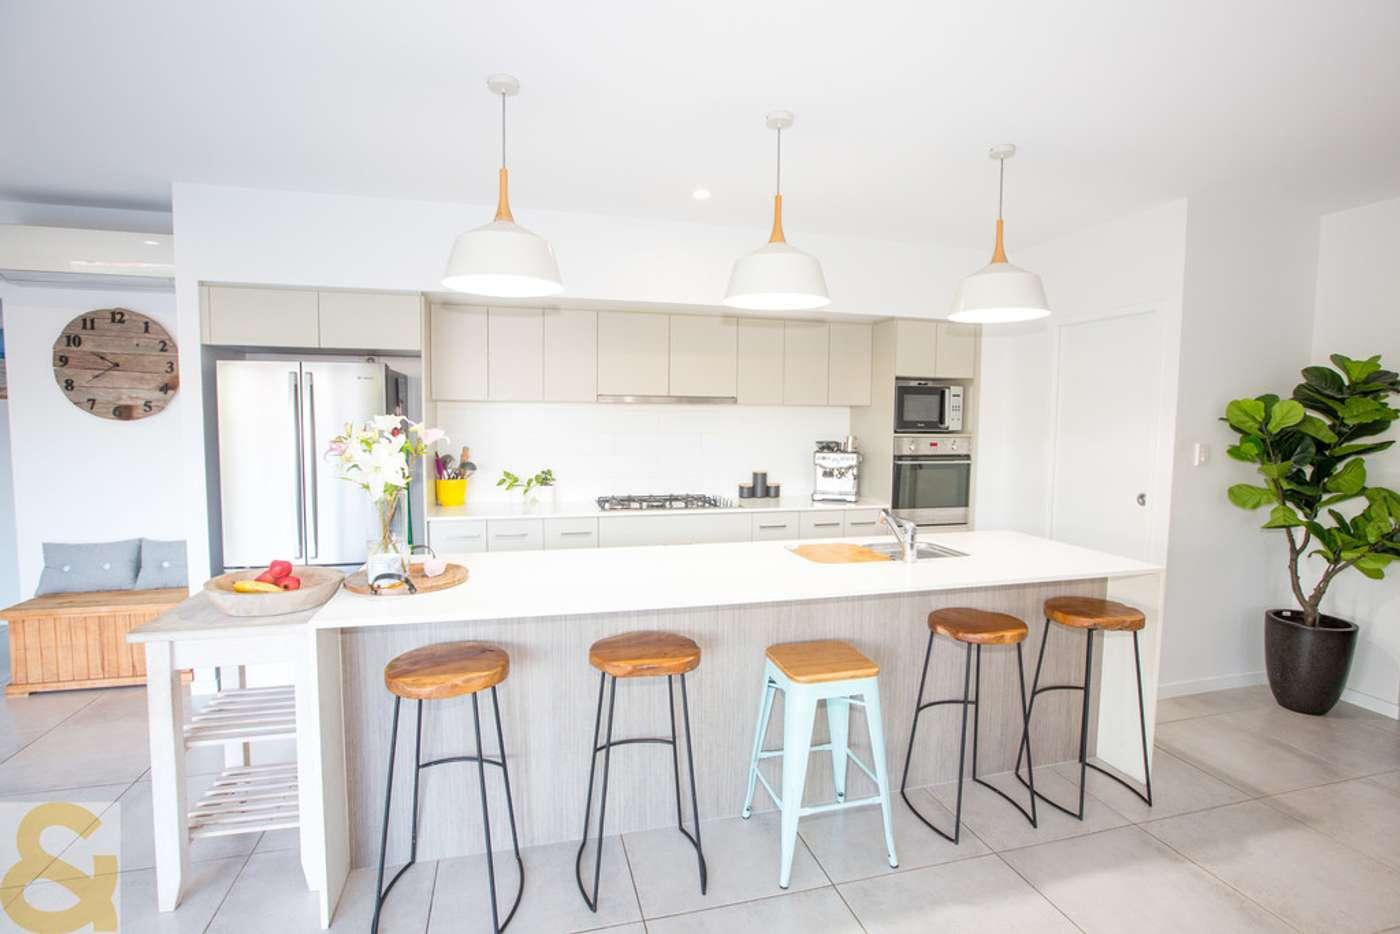 Main view of Homely house listing, 4 JULAJI CLOSE, Cooya Beach QLD 4873